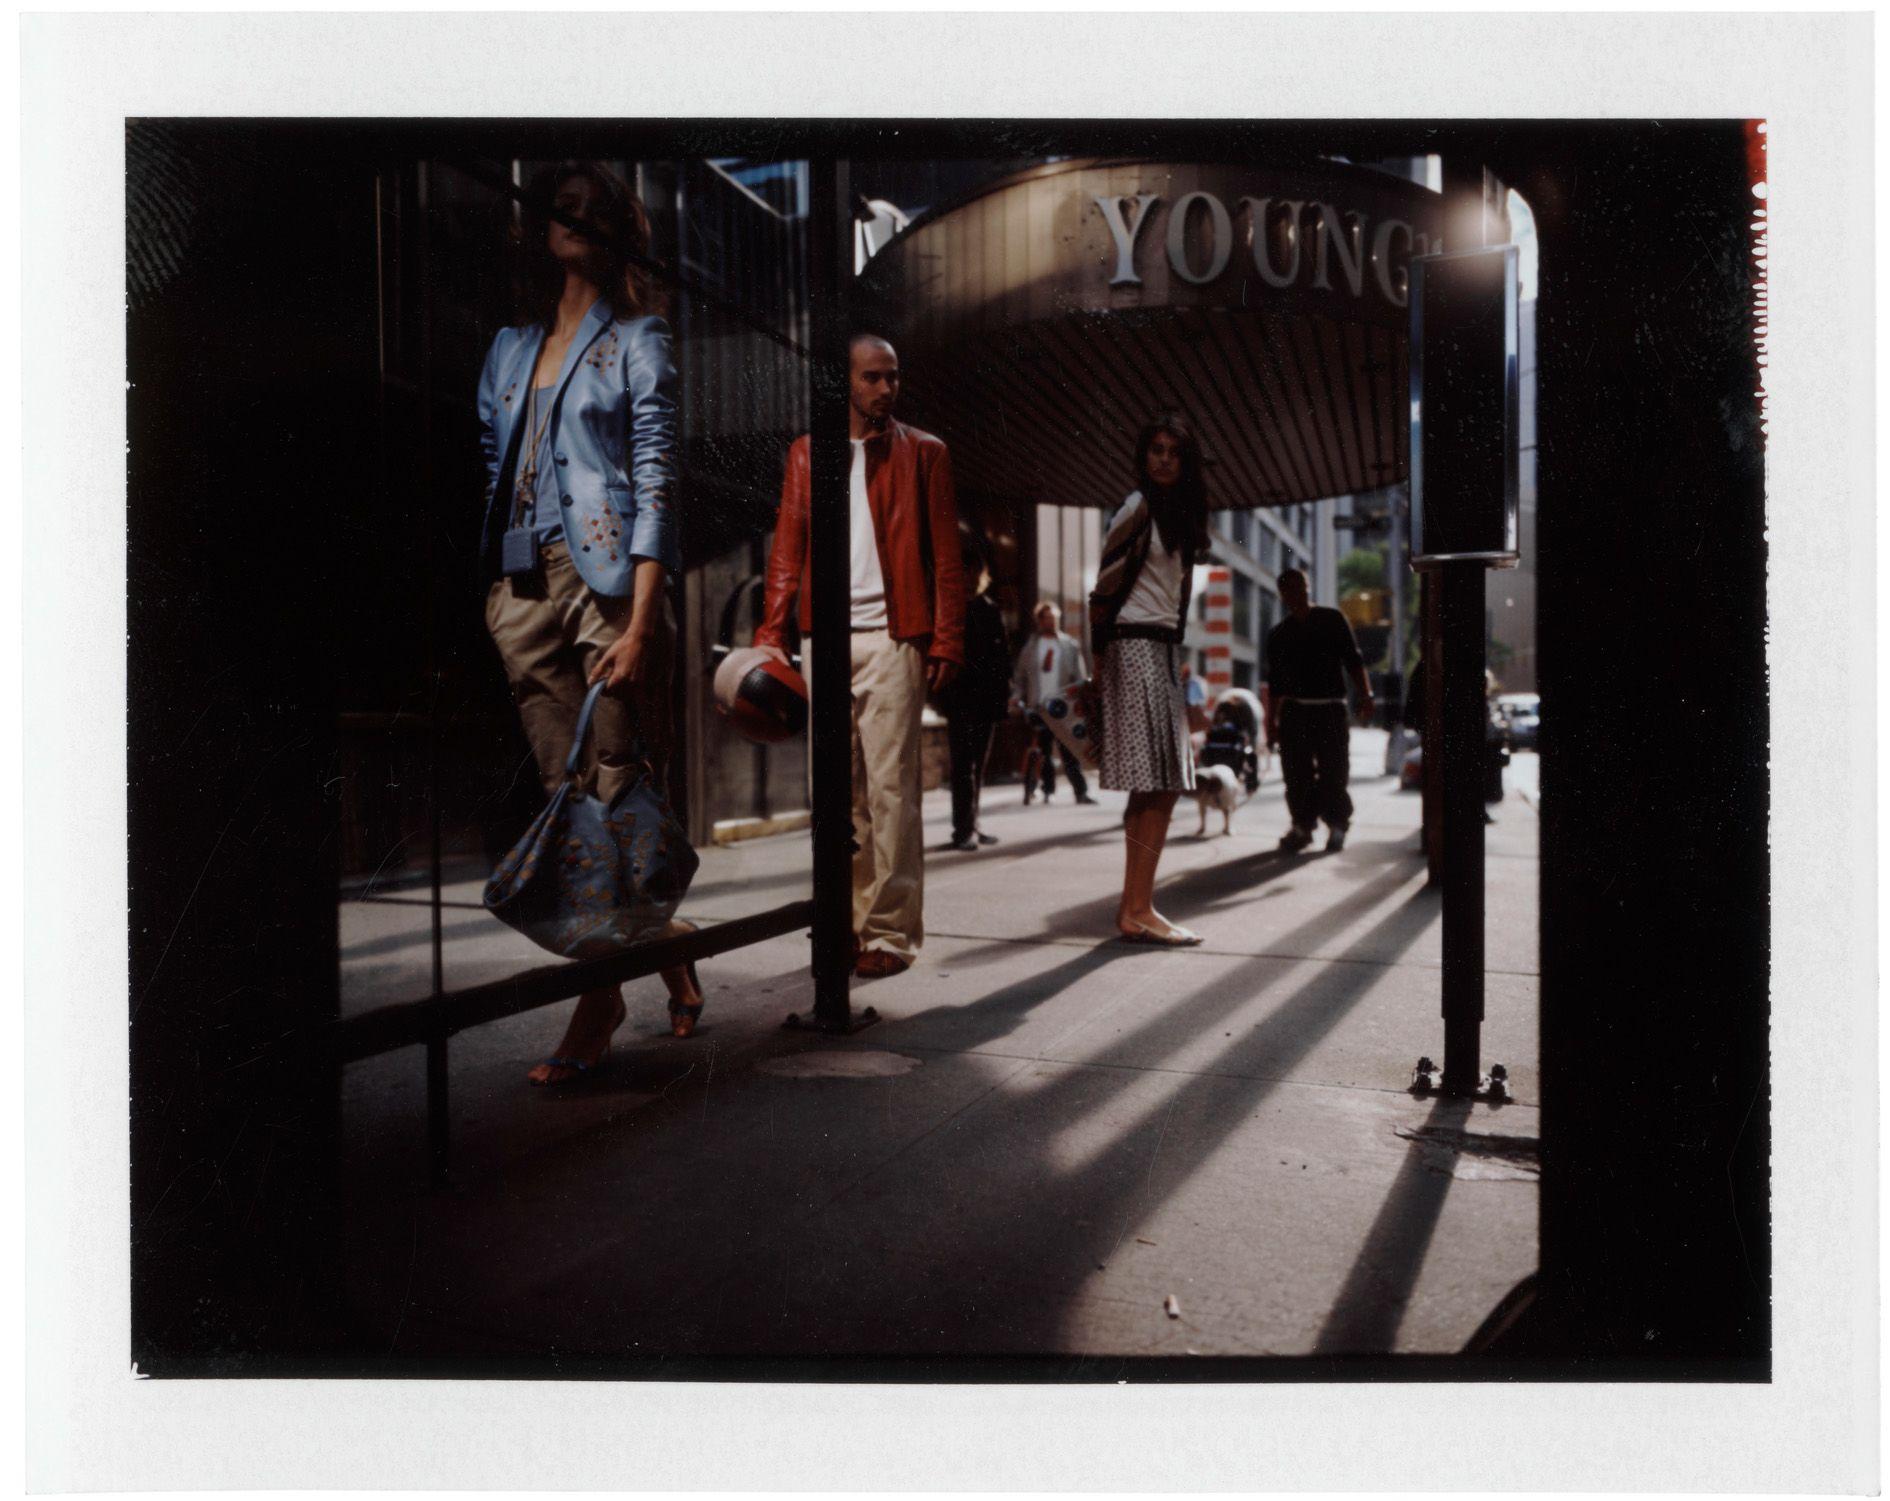 Philip-Lorca diCorcia – Roid – London